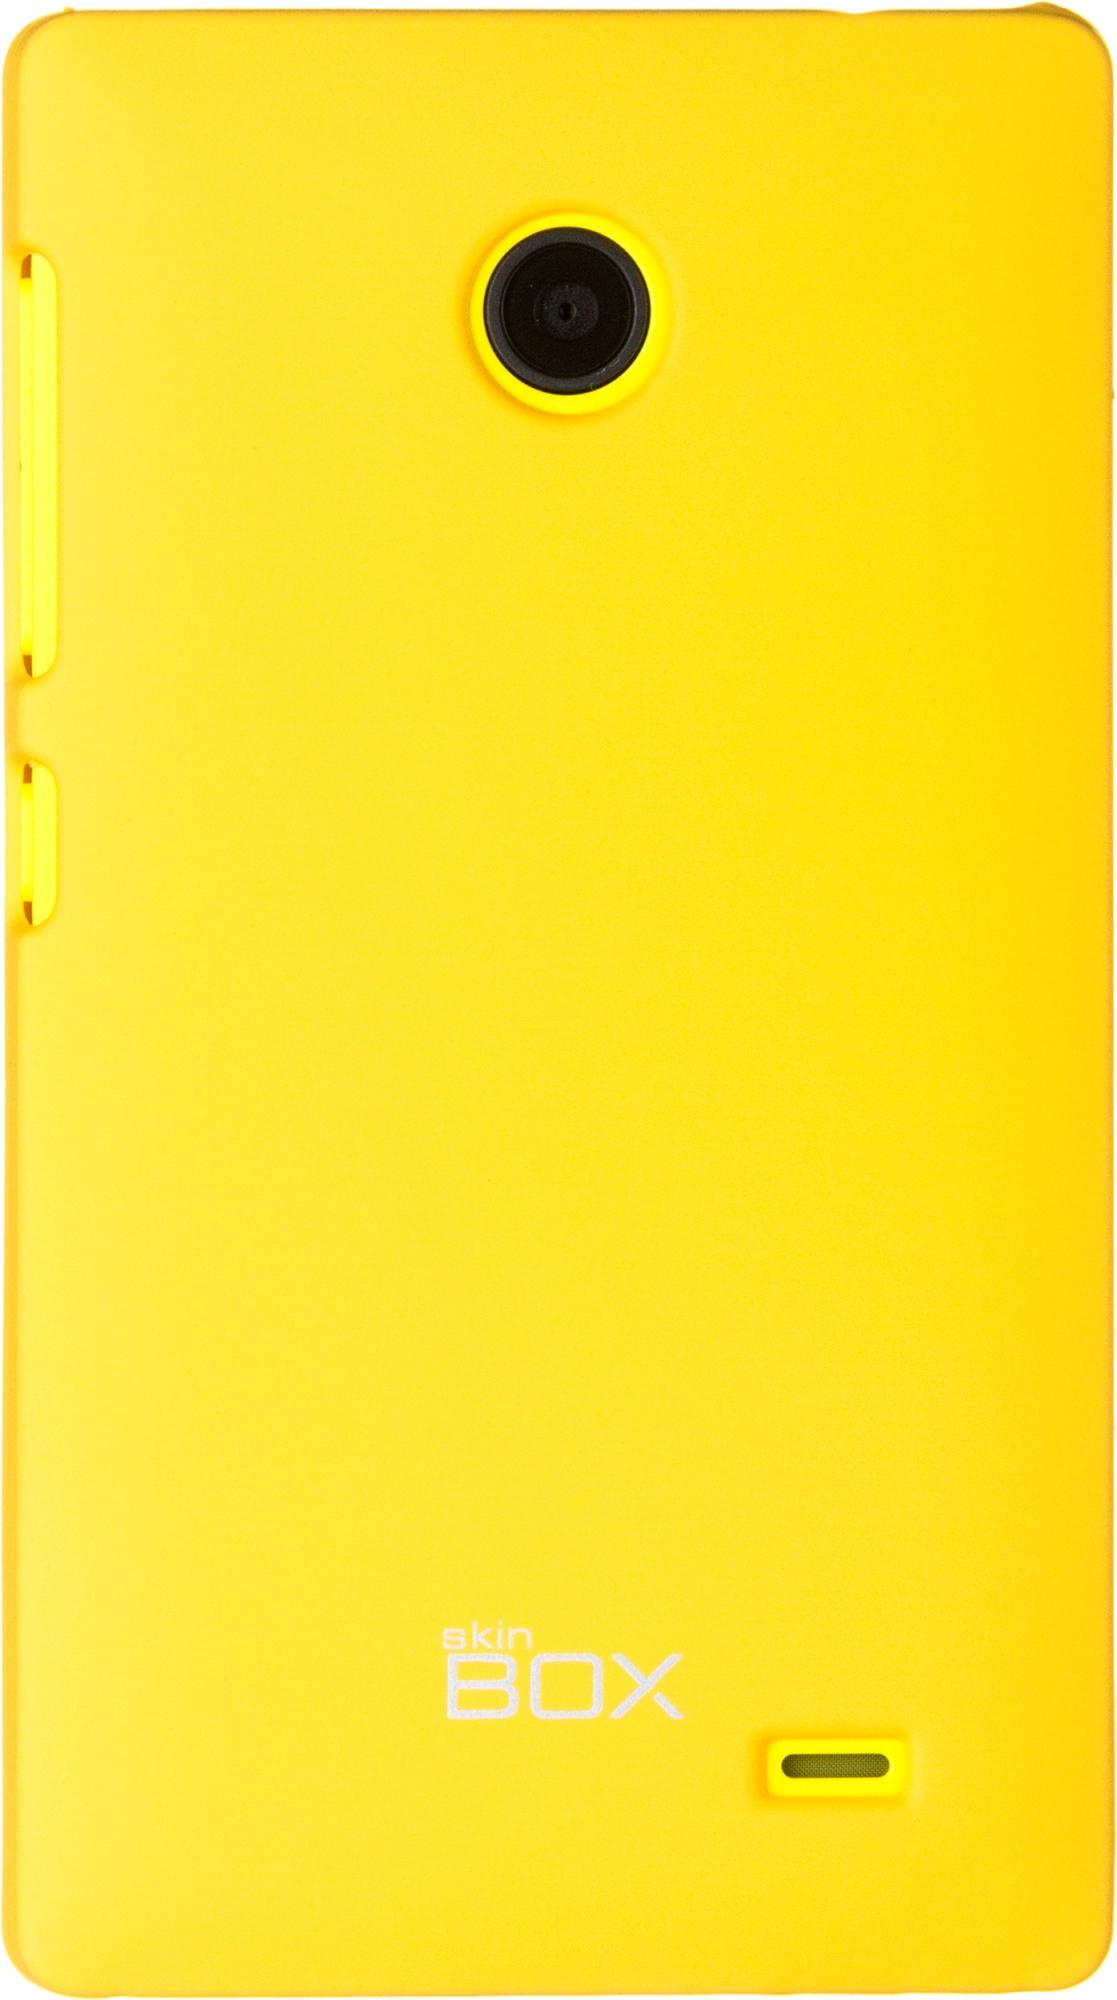 Чехол для сотового телефона skinBOX 4People, 4630042526730, желтый чехол для сотового телефона skinbox 4people 4630042526730 желтый